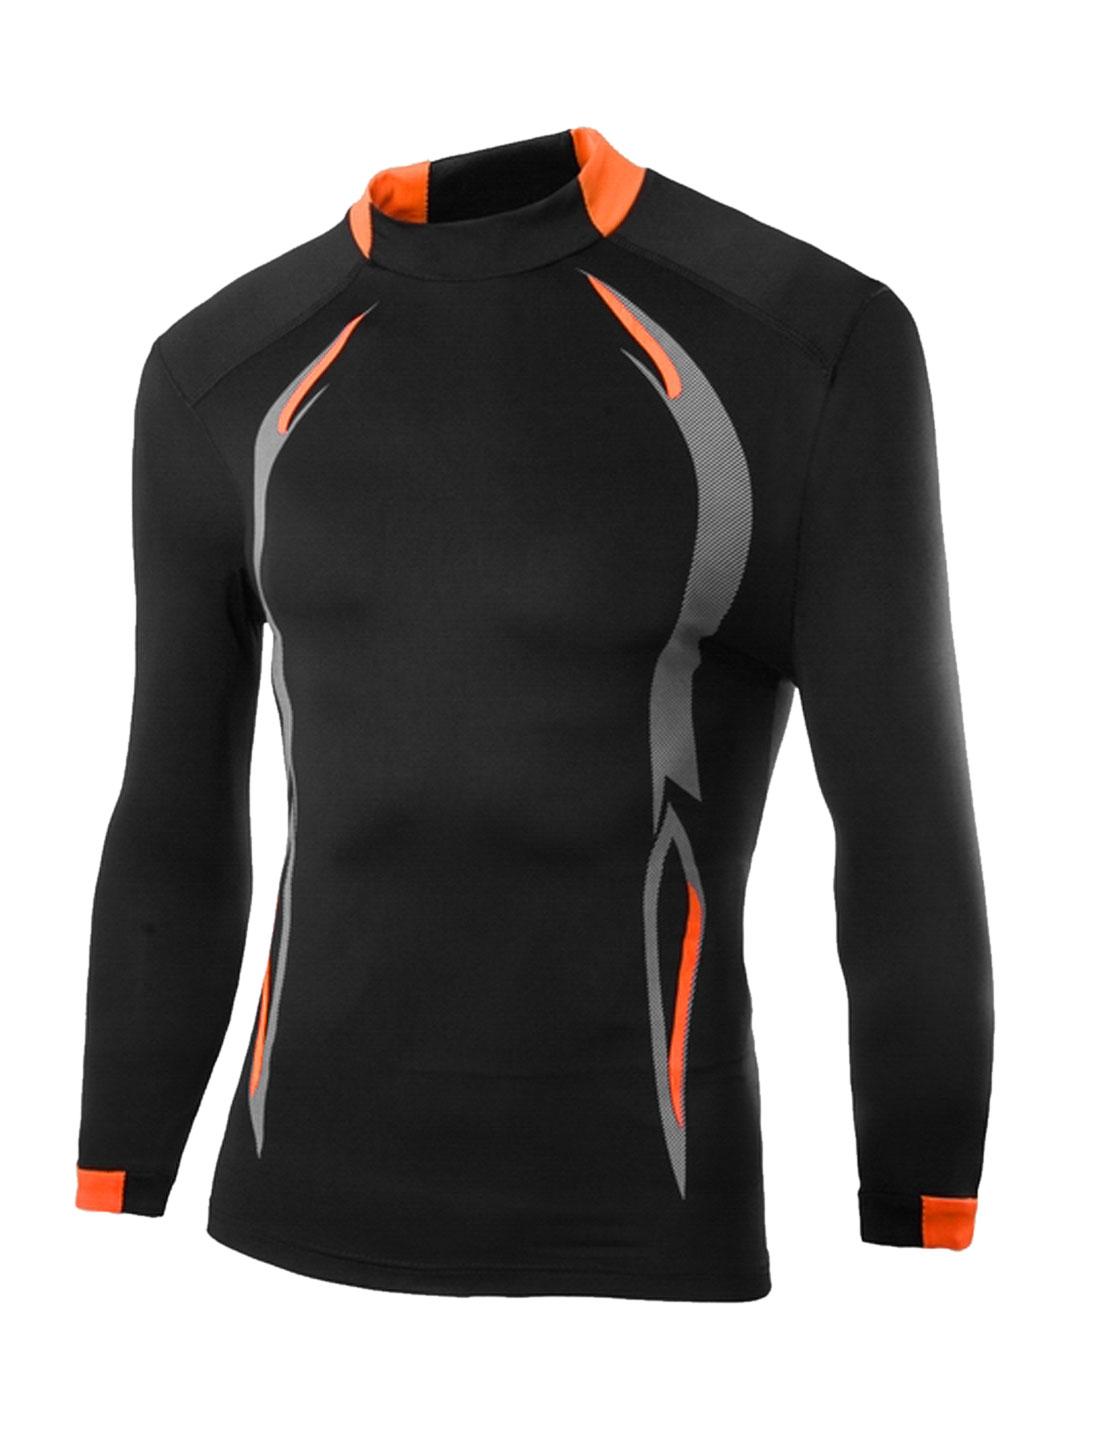 Men Contrast Color Novelty Prints Stretchy T-Shirt Black Light Gra